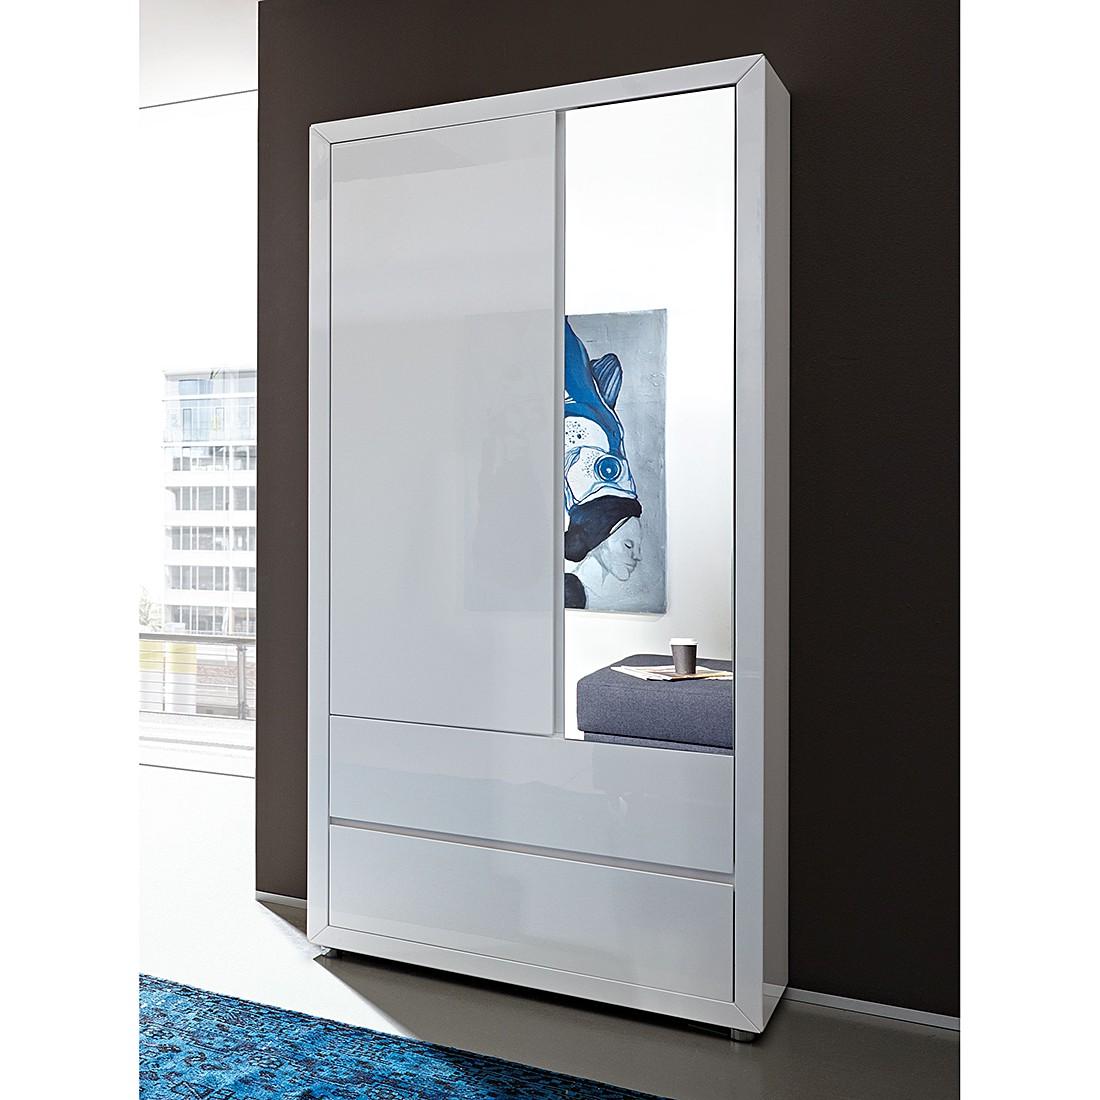 20 sparen garderobe function in wei nur 479 99 cherry m bel home24. Black Bedroom Furniture Sets. Home Design Ideas